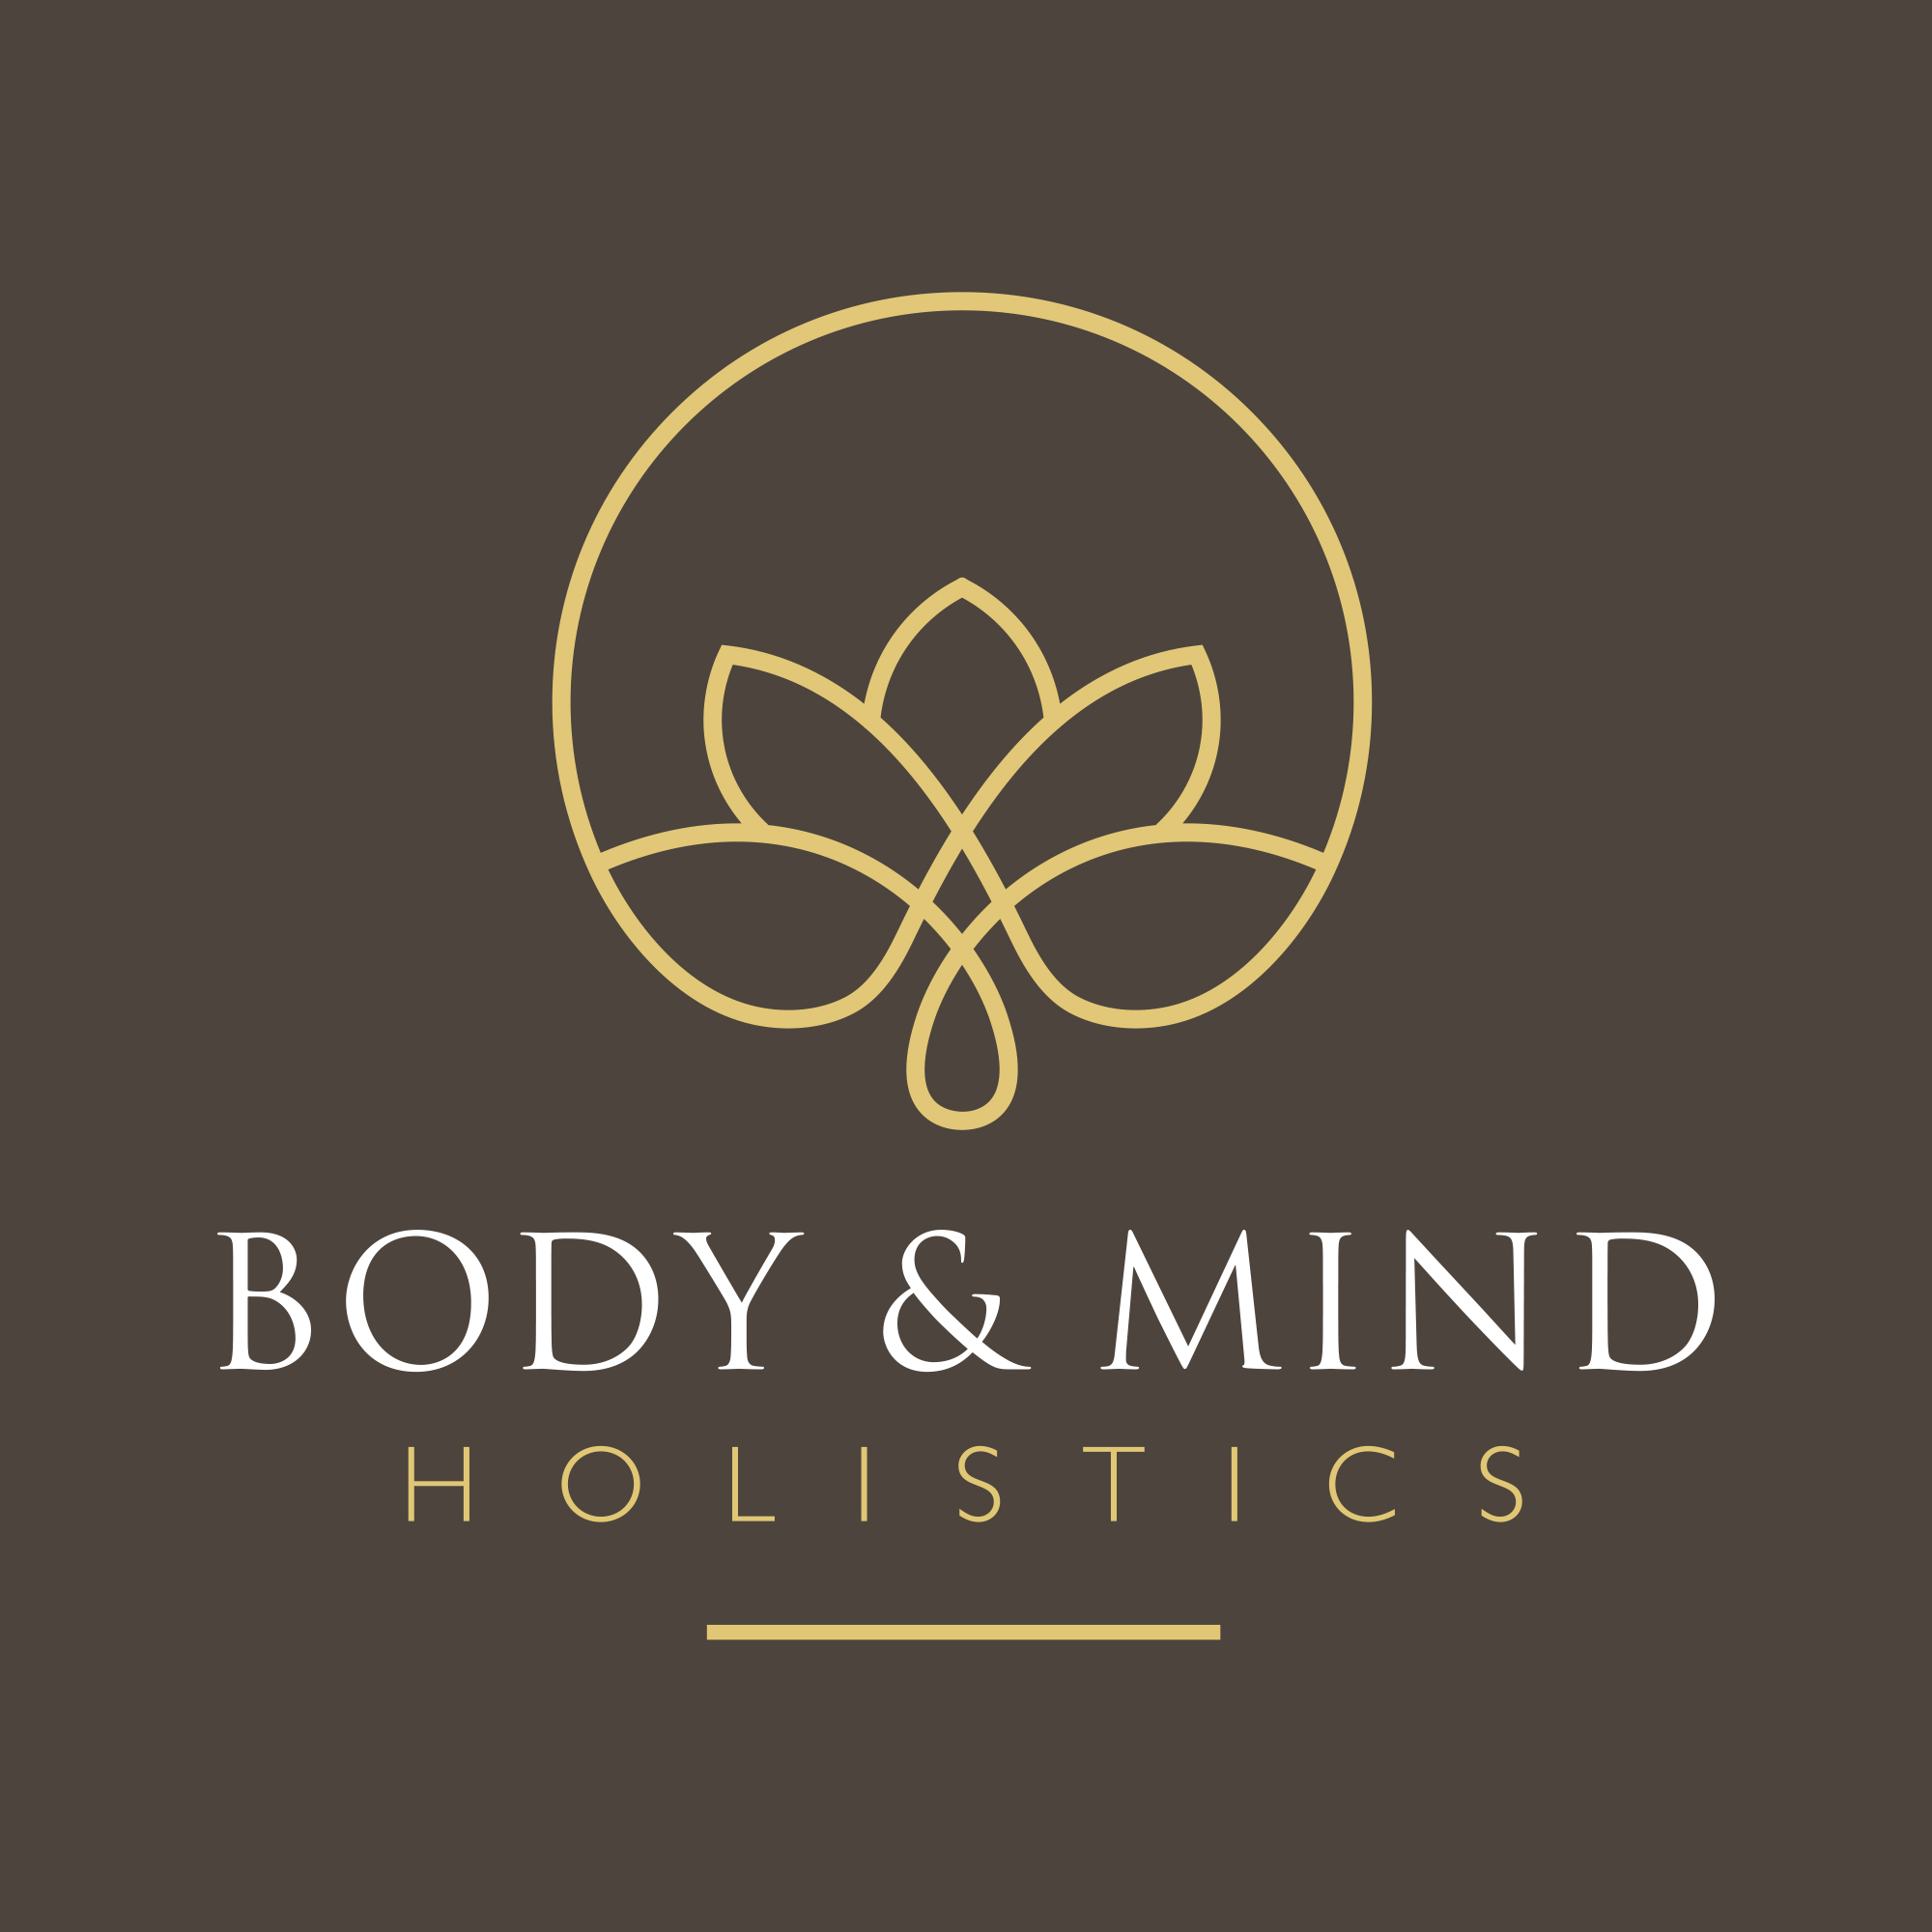 Body and Mind Holistics